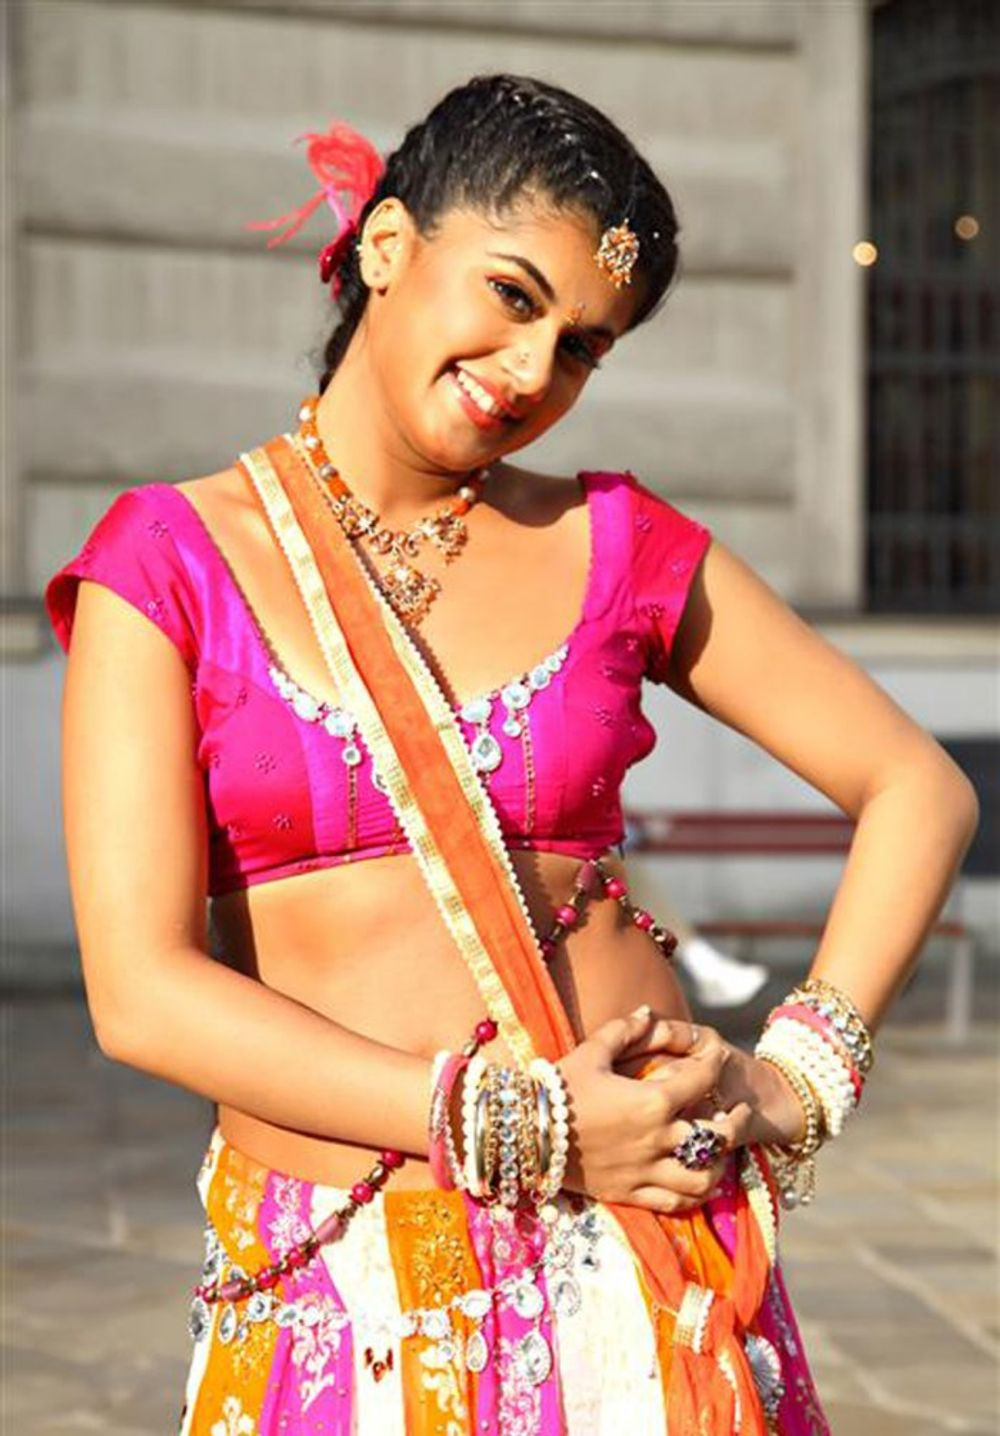 Taapsee Pannu in Vastadu Naa Raju (2011)